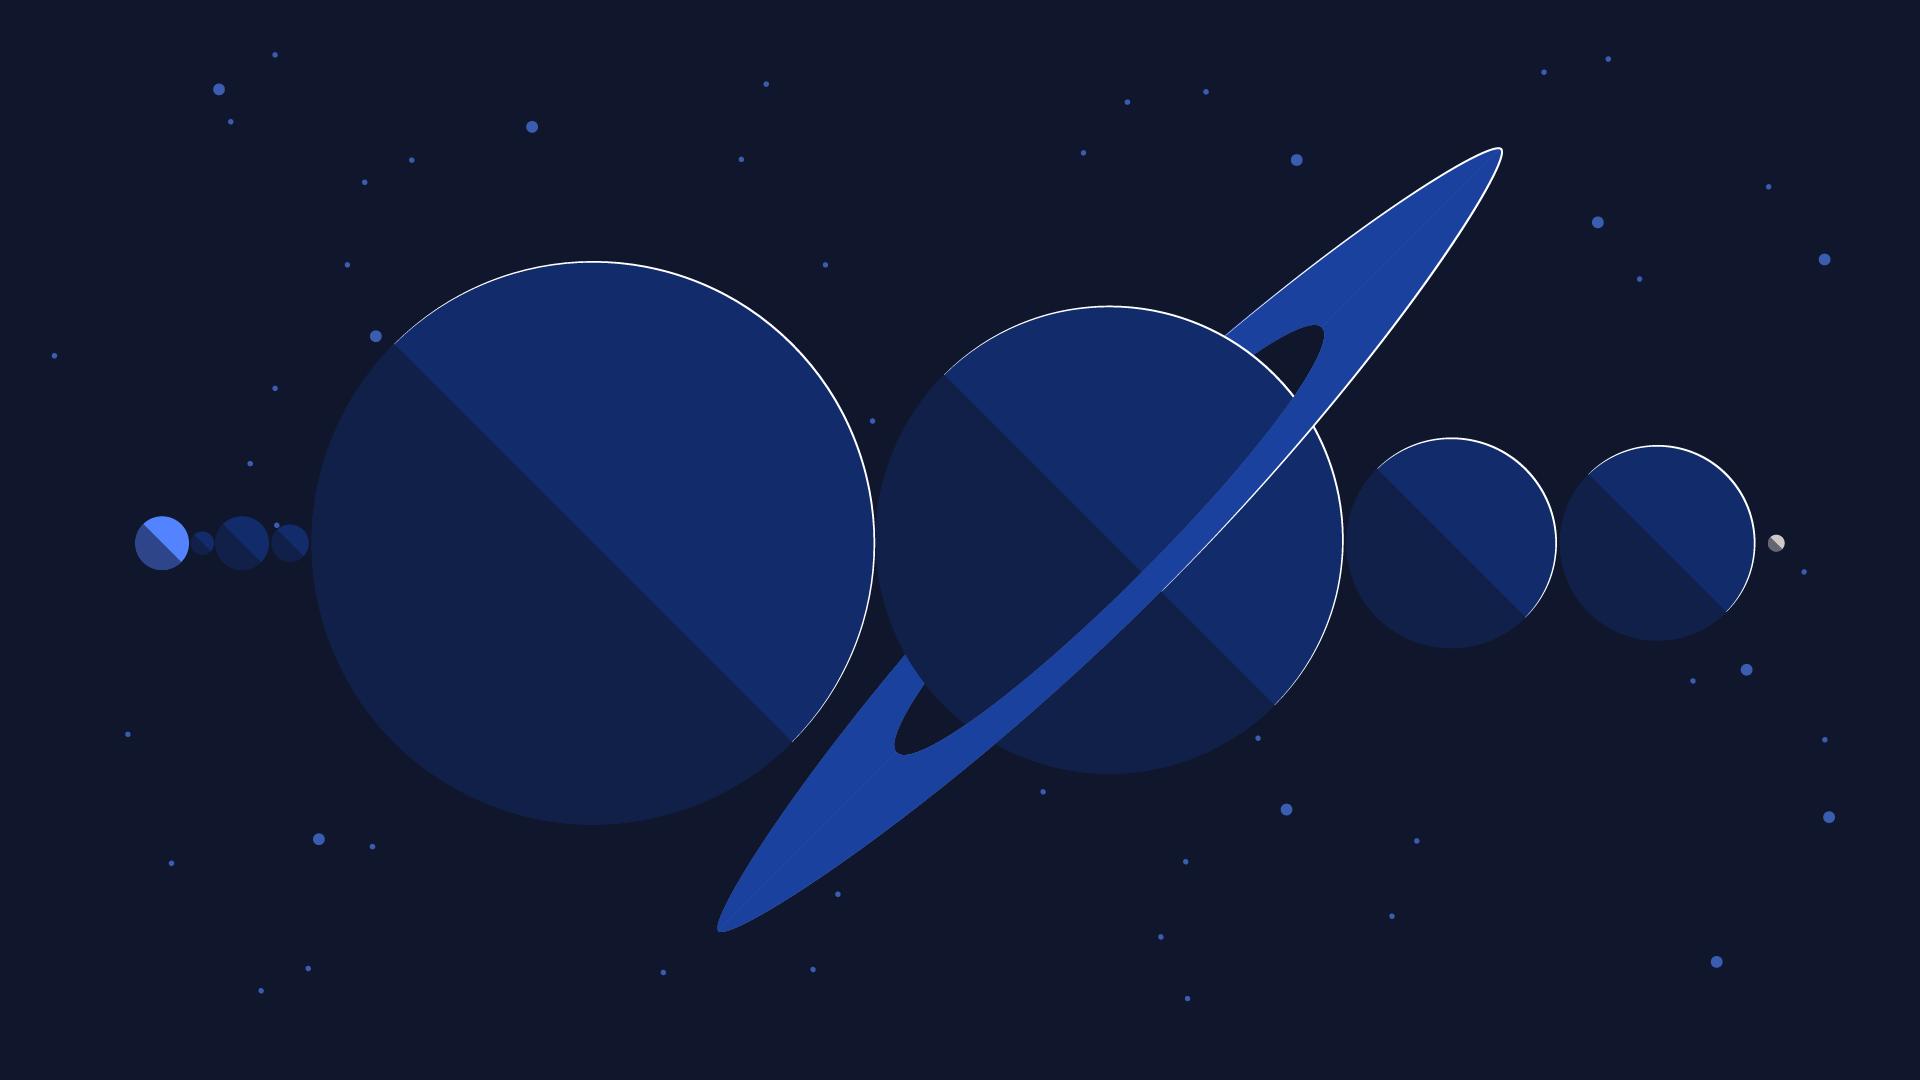 inanutshell-kurzgesagt-audi-mission-to-moon-07